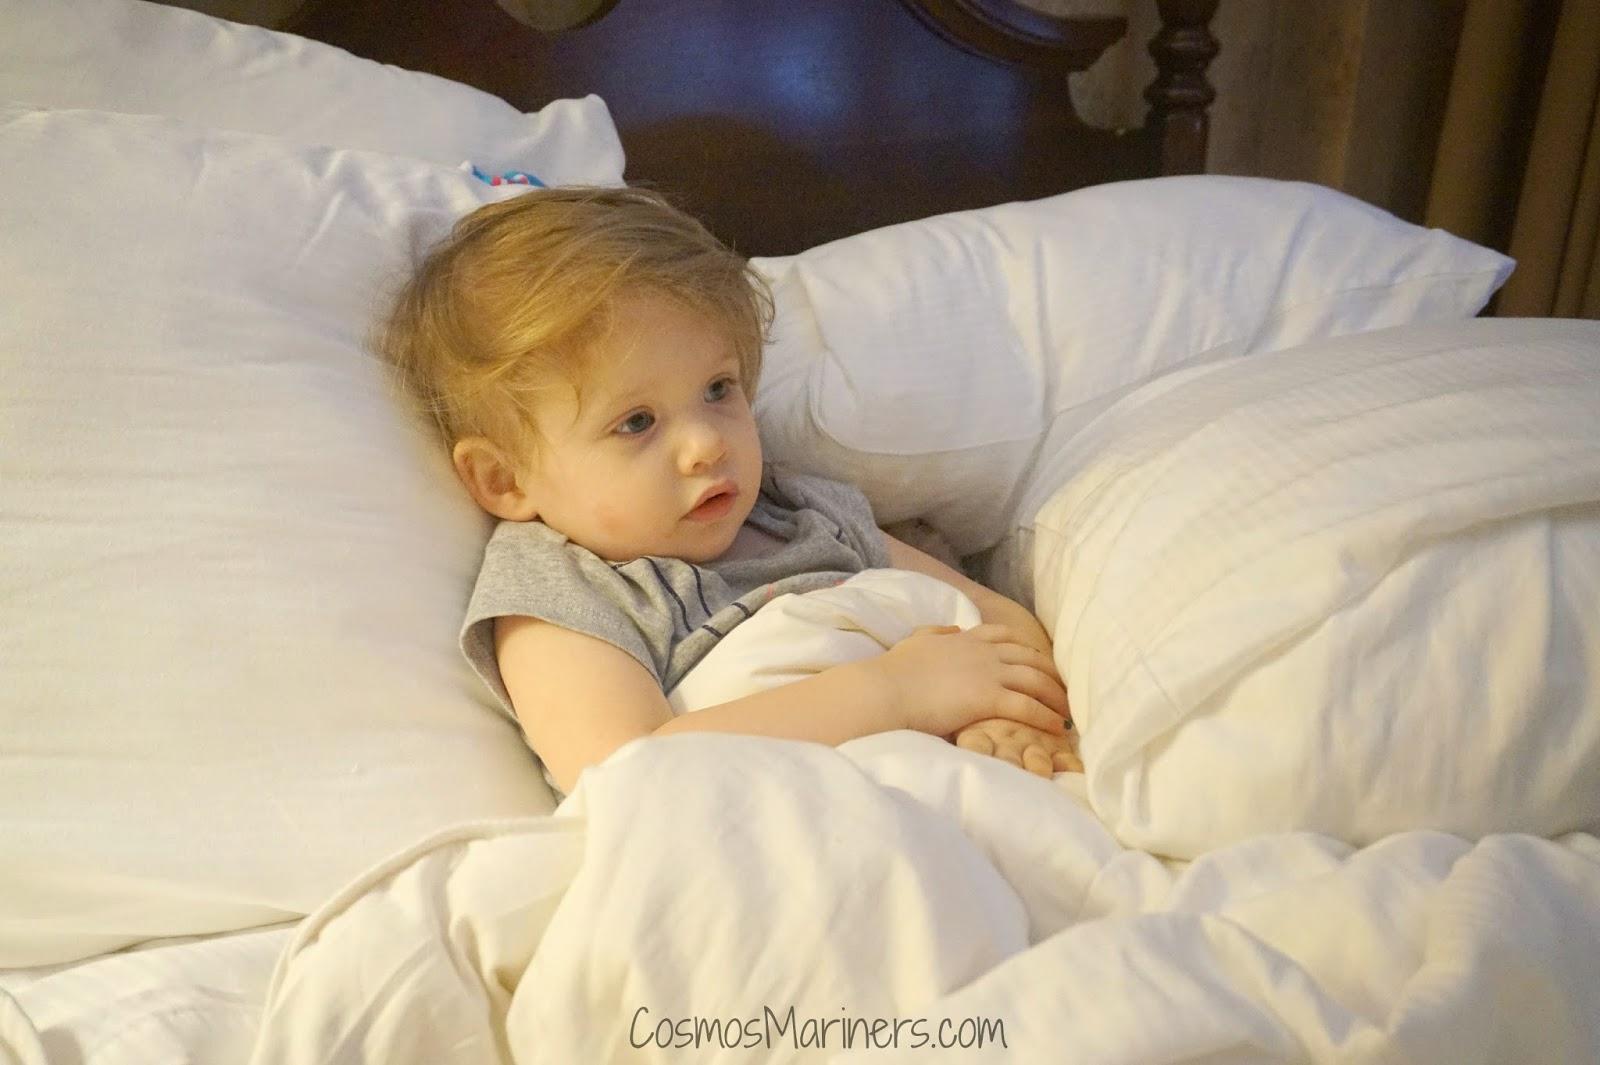 The Dunhill Hotel, Charlotte, North Carolina: A Hotel Review   CosmosMariners.com